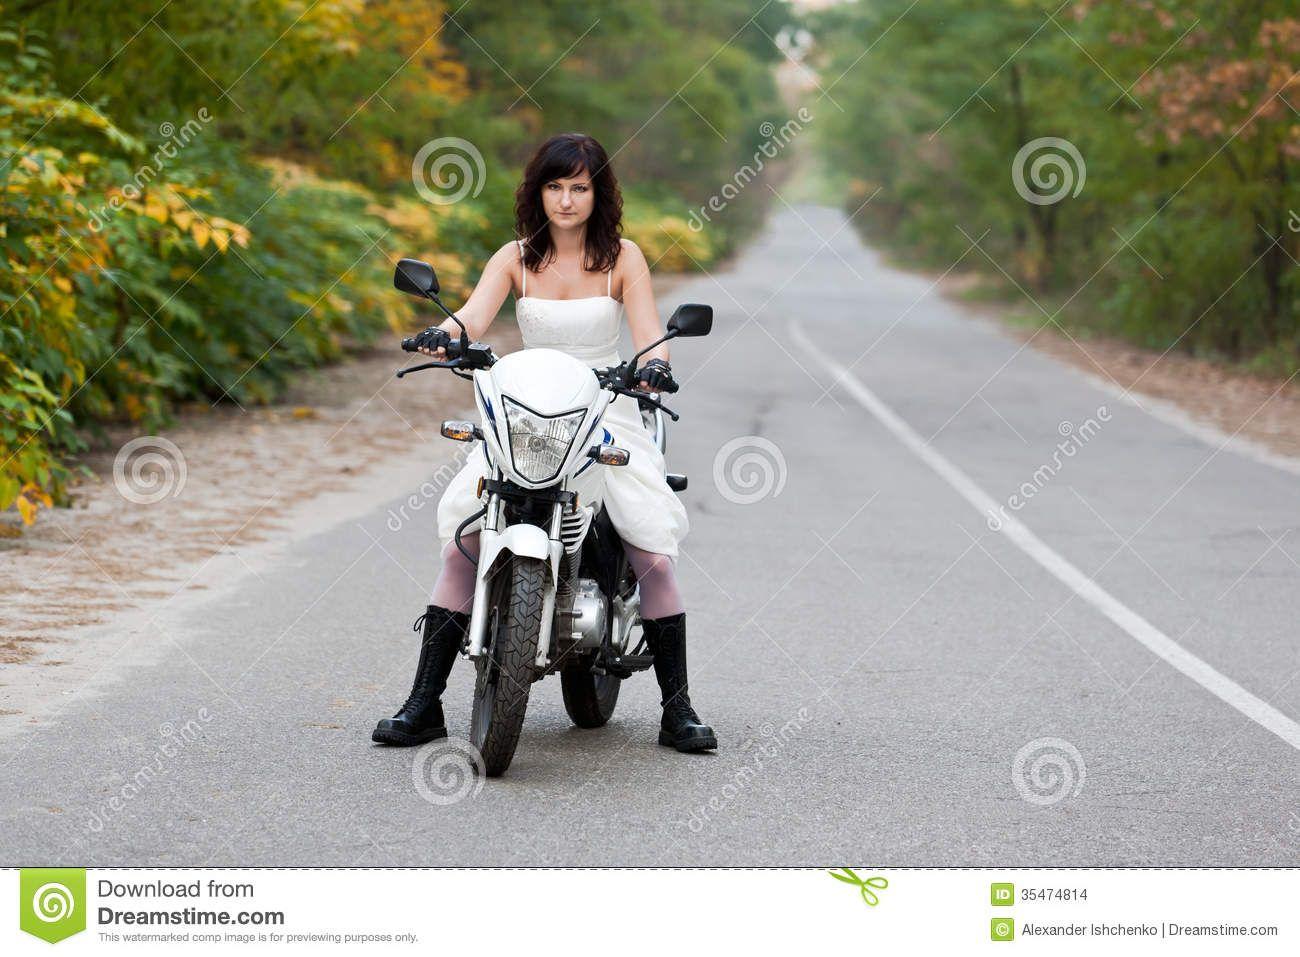 Biker Wedding Dresses Image With Bride In Wedding Dress On ...